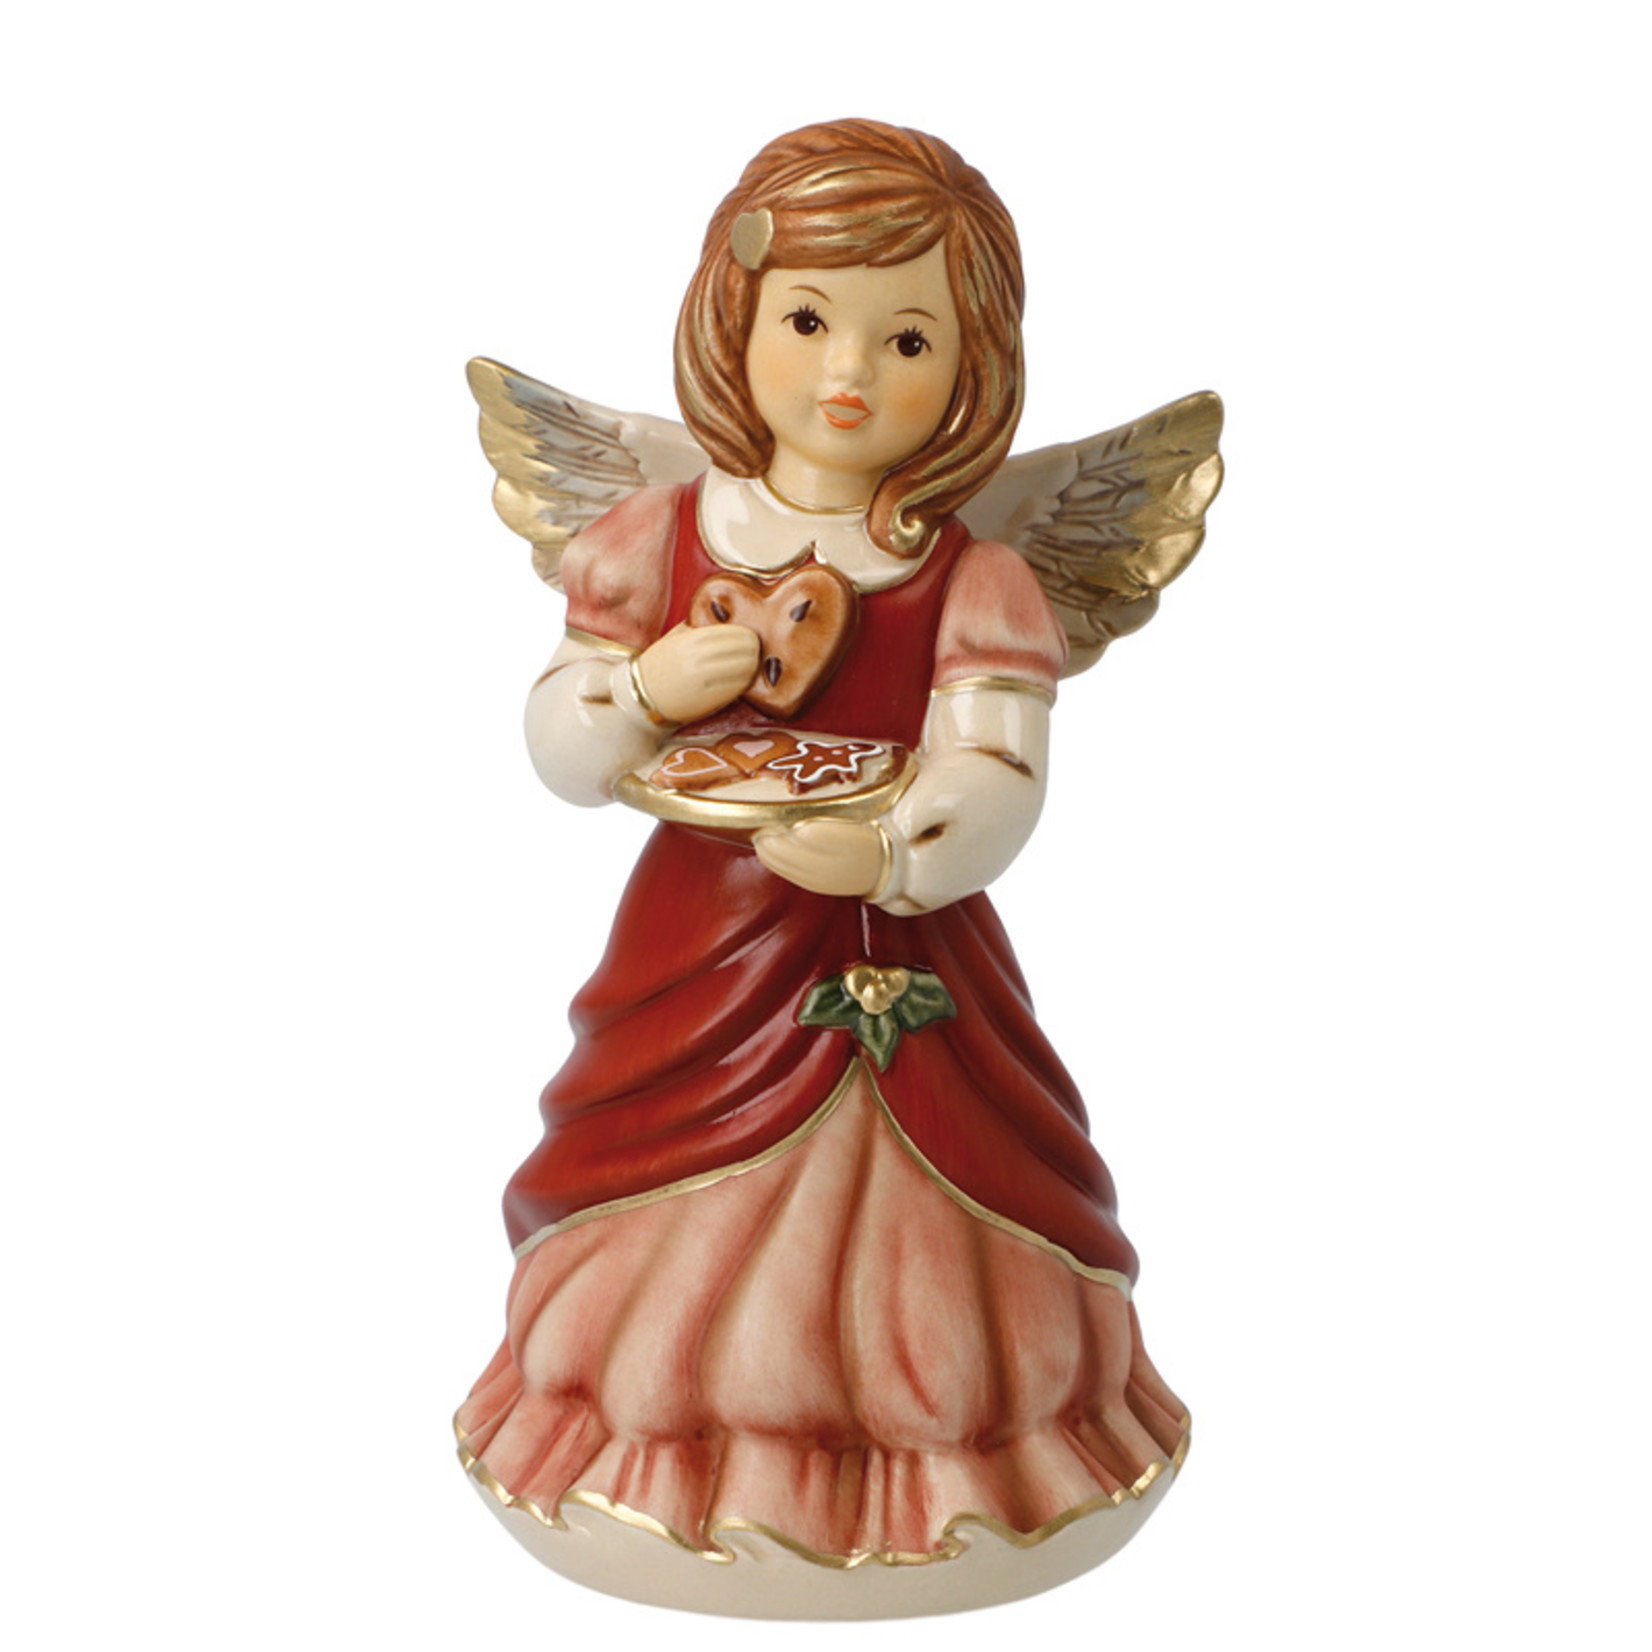 "Goebel Porzellanmanufaktur Engel ""Süße Leckereien"" mit Lebkuchen   bordeaux   Goebel Porzellan"